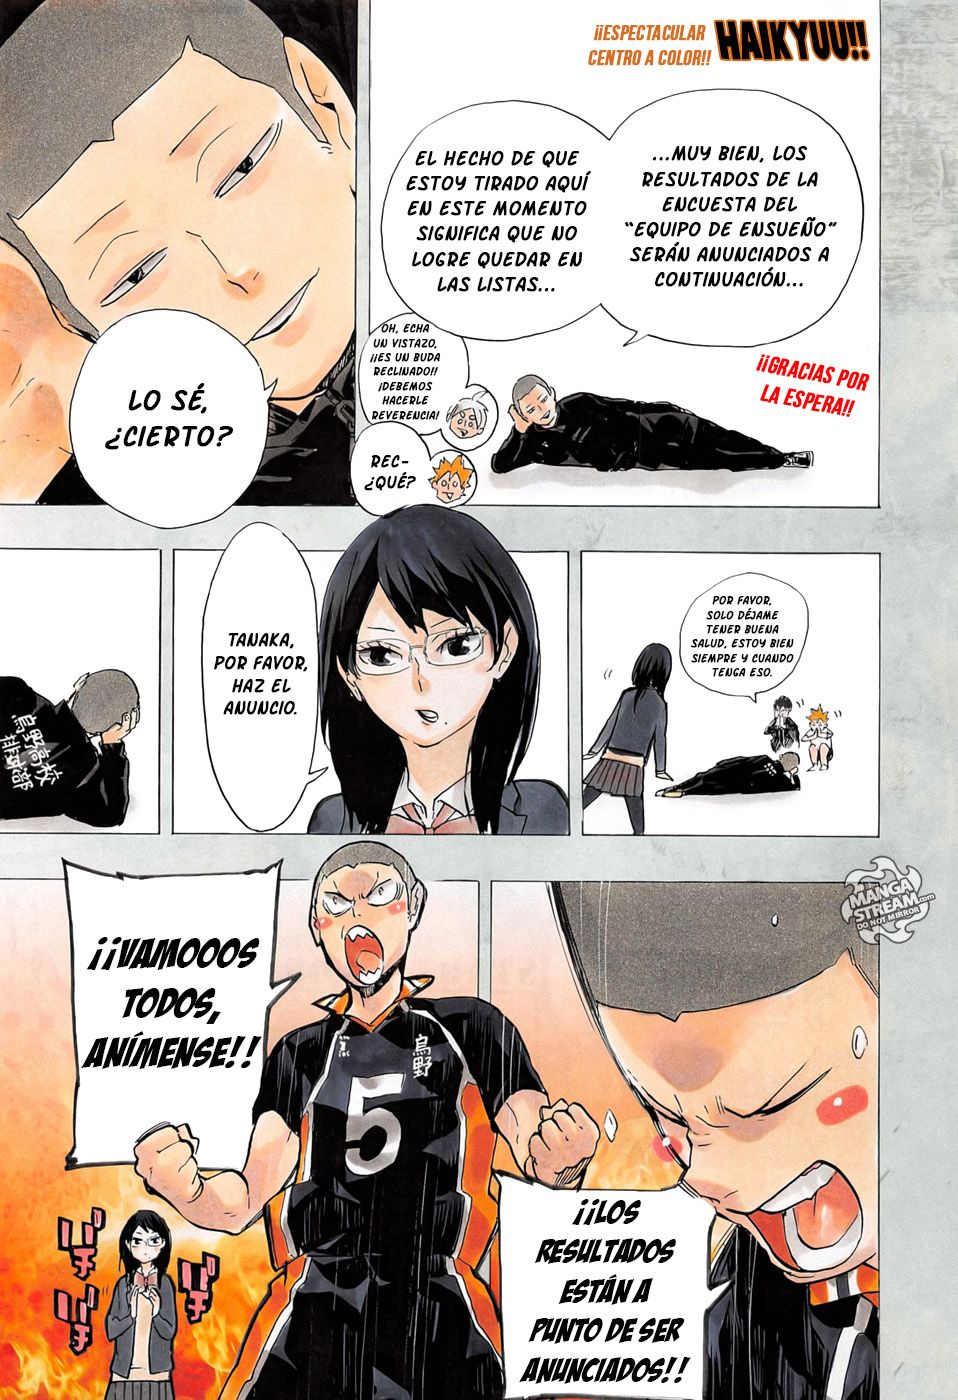 http://c5.ninemanga.com/es_manga/10/10/482839/edf96cef9d706a65c9adaf1fa871fd28.jpg Page 2